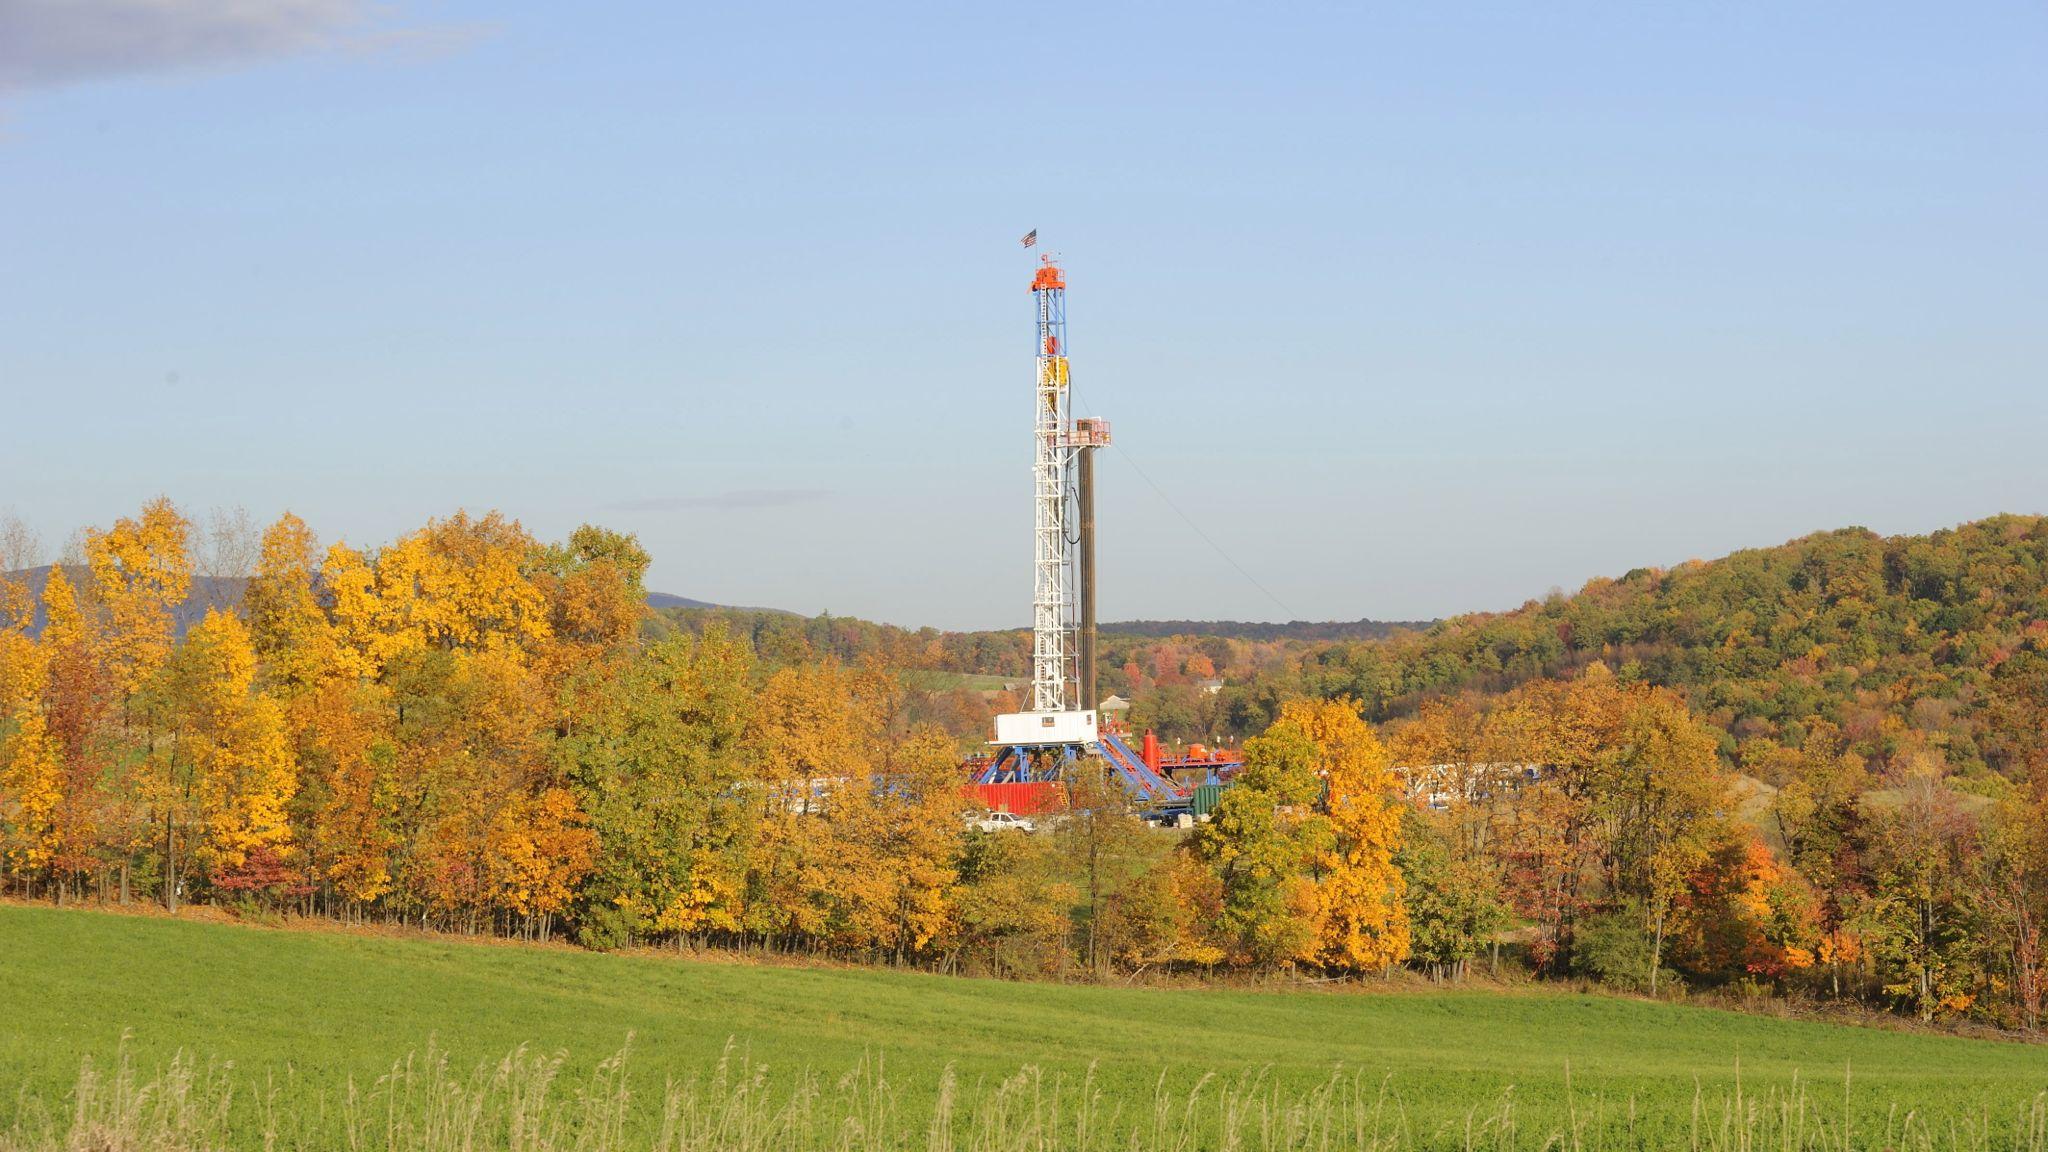 Fracking contamination traced to leaky well linings nova next pbs publicscrutiny Choice Image